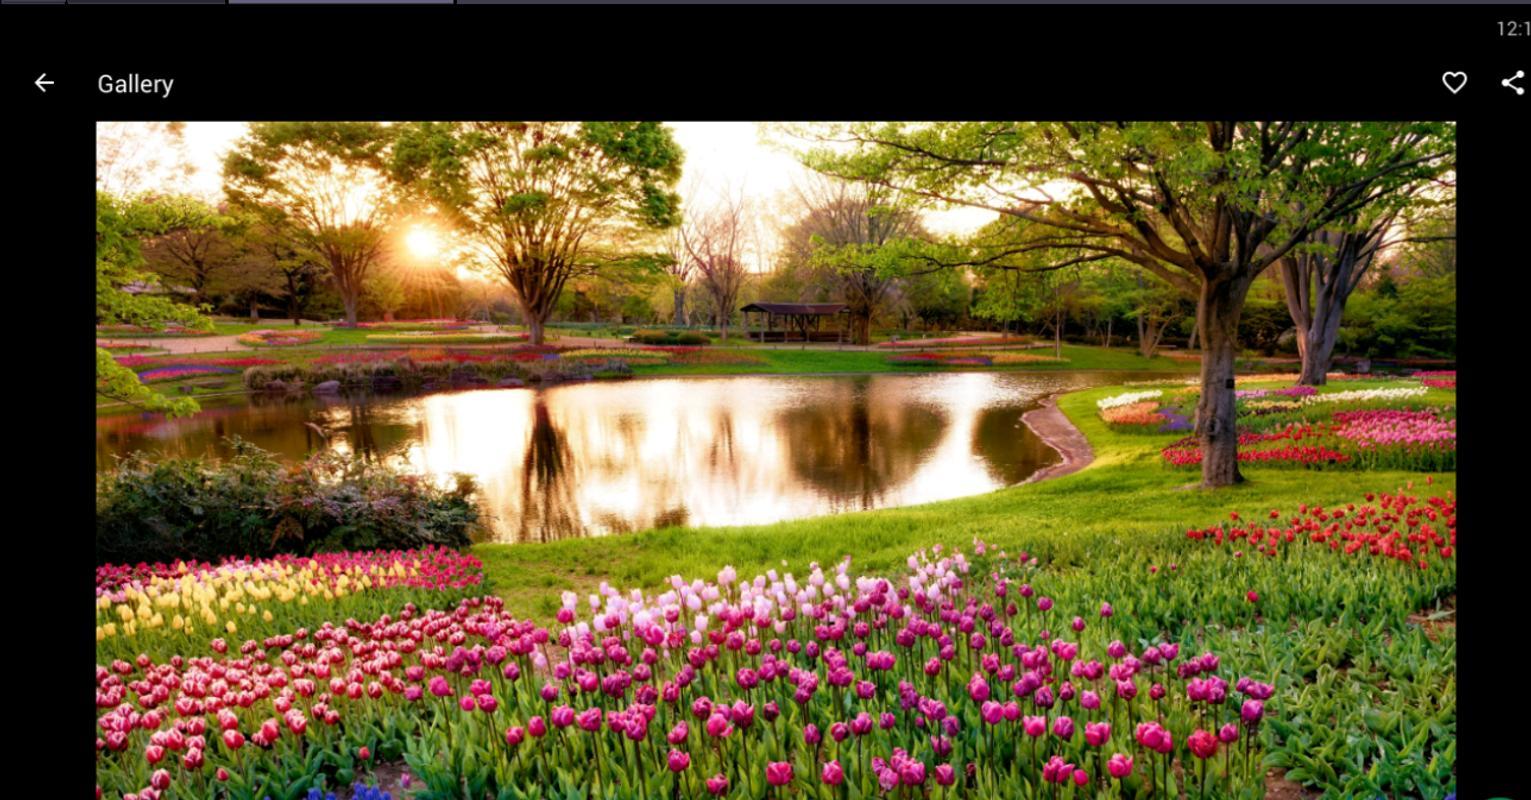 Fondos pantalla primavera hd apk download gratis for Fondo de pantalla primavera